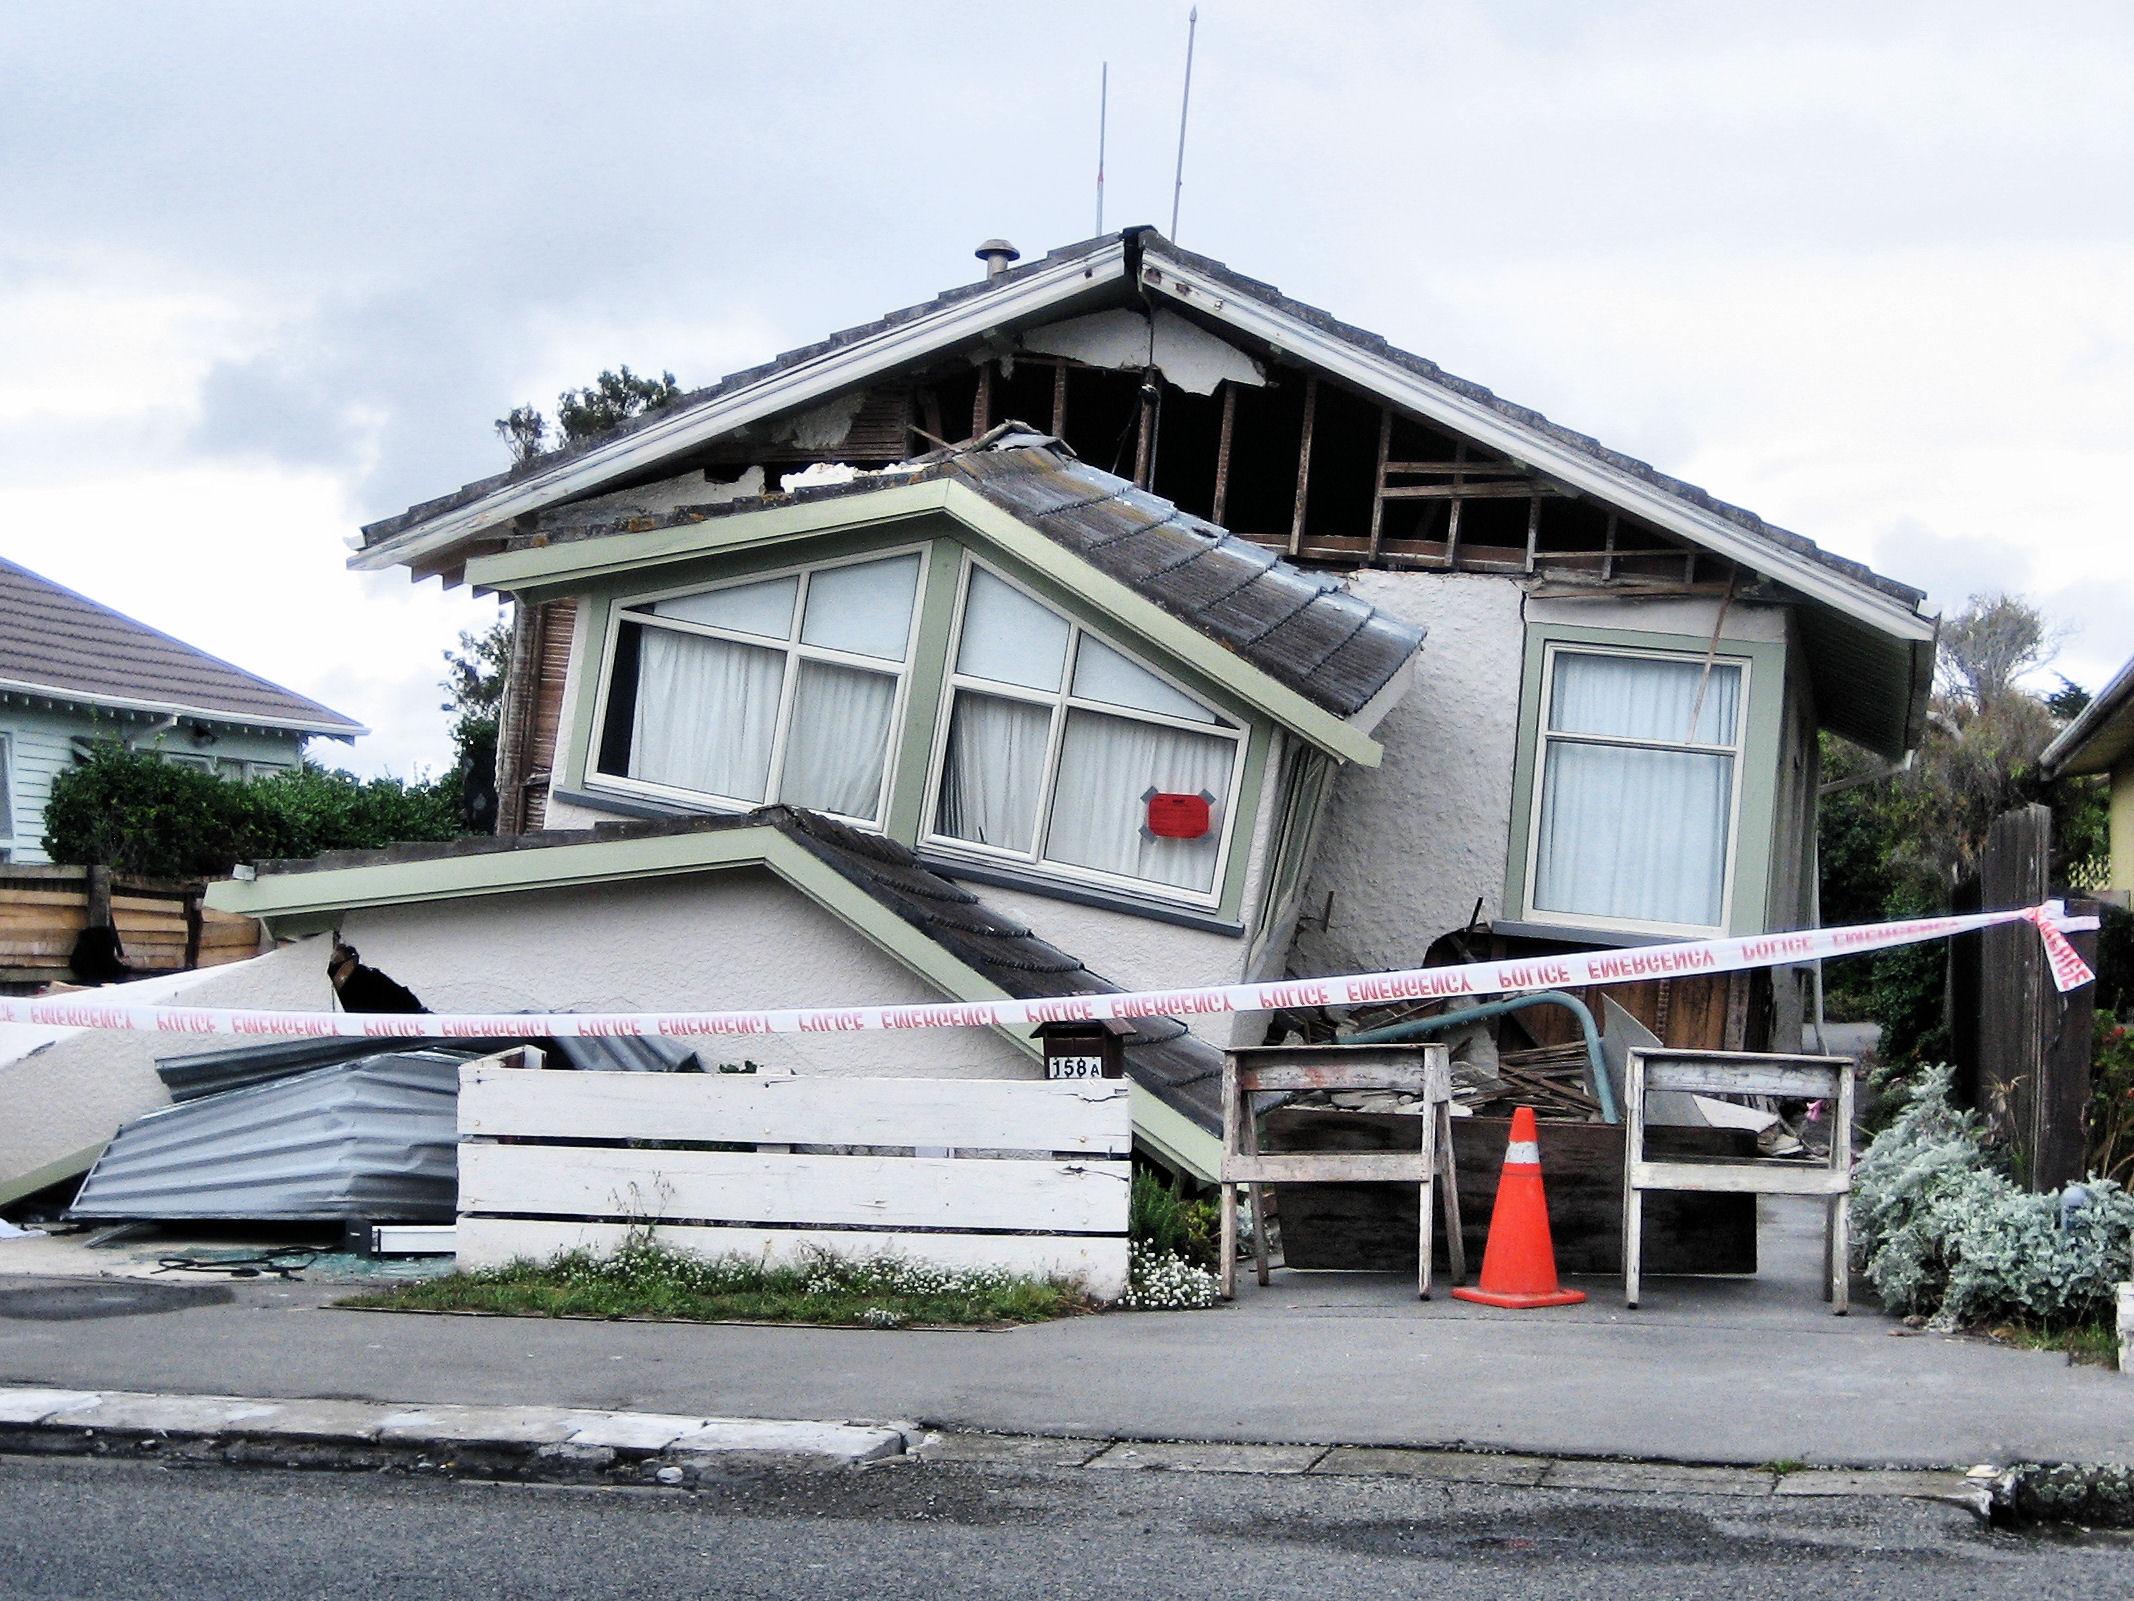 A badly damaged house in North New Brighton, Christchurch following Feb 22 quake